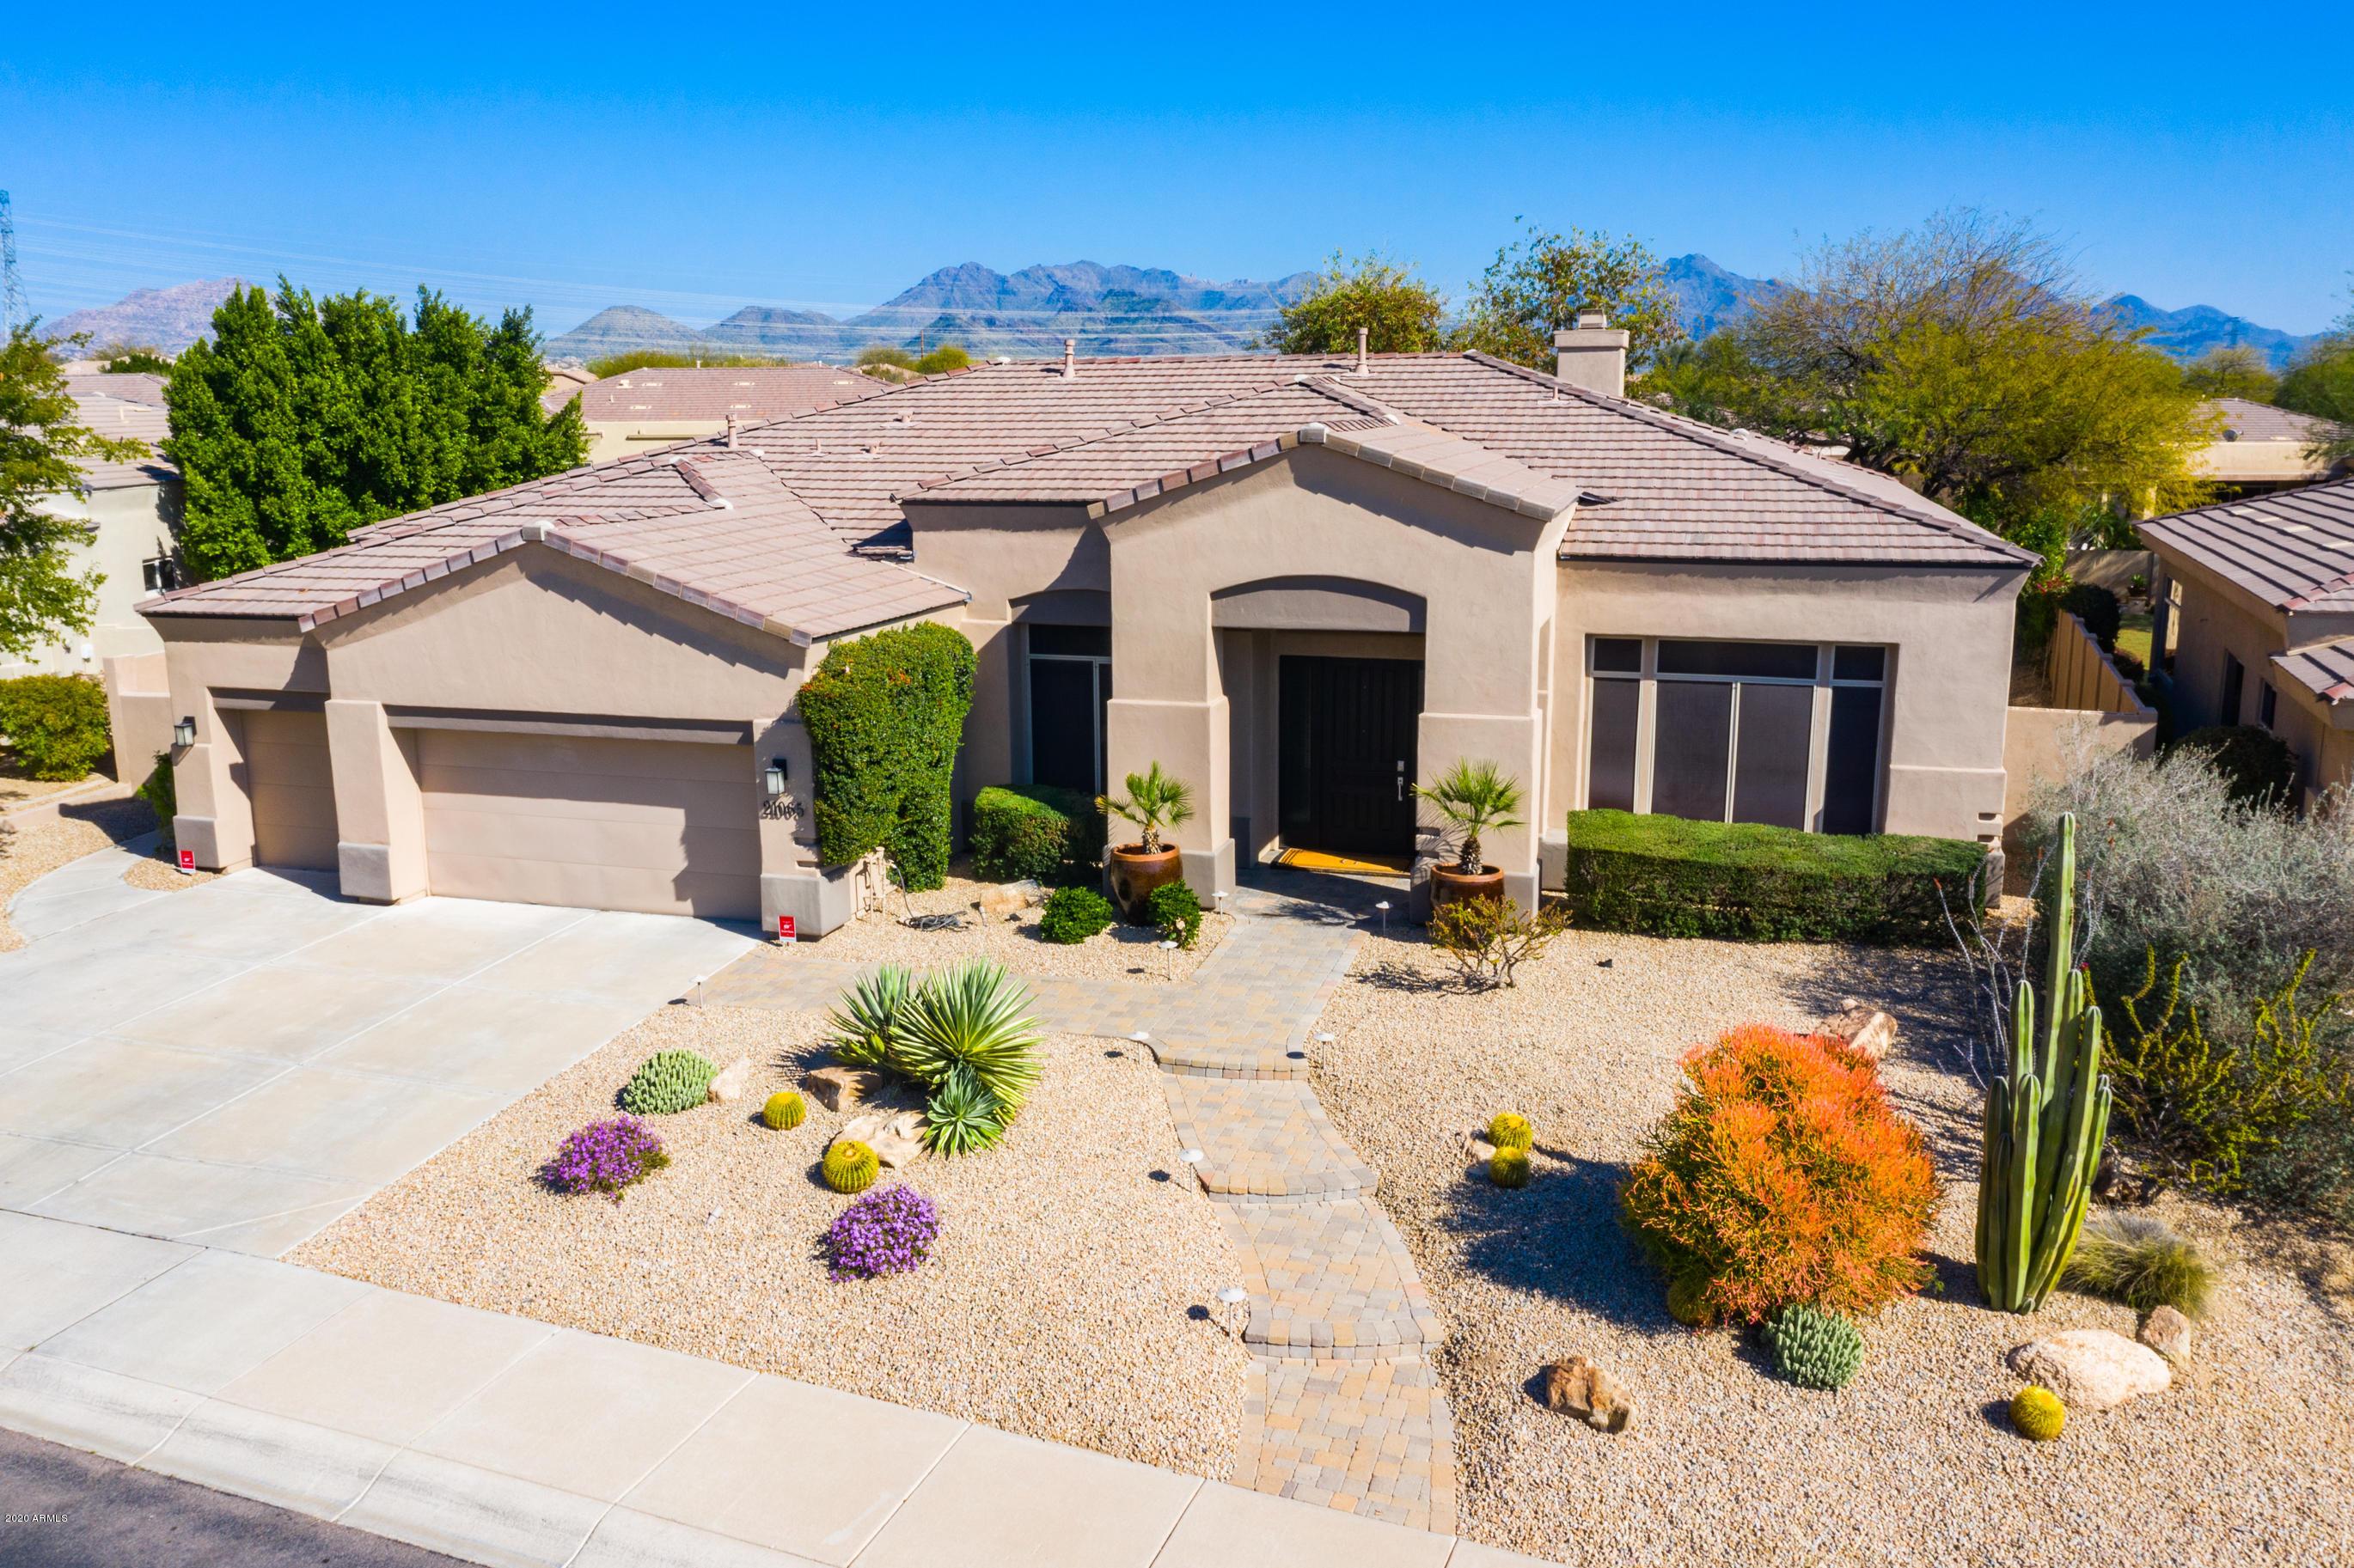 Photo of 21065 N 74th Way, Scottsdale, AZ 85255